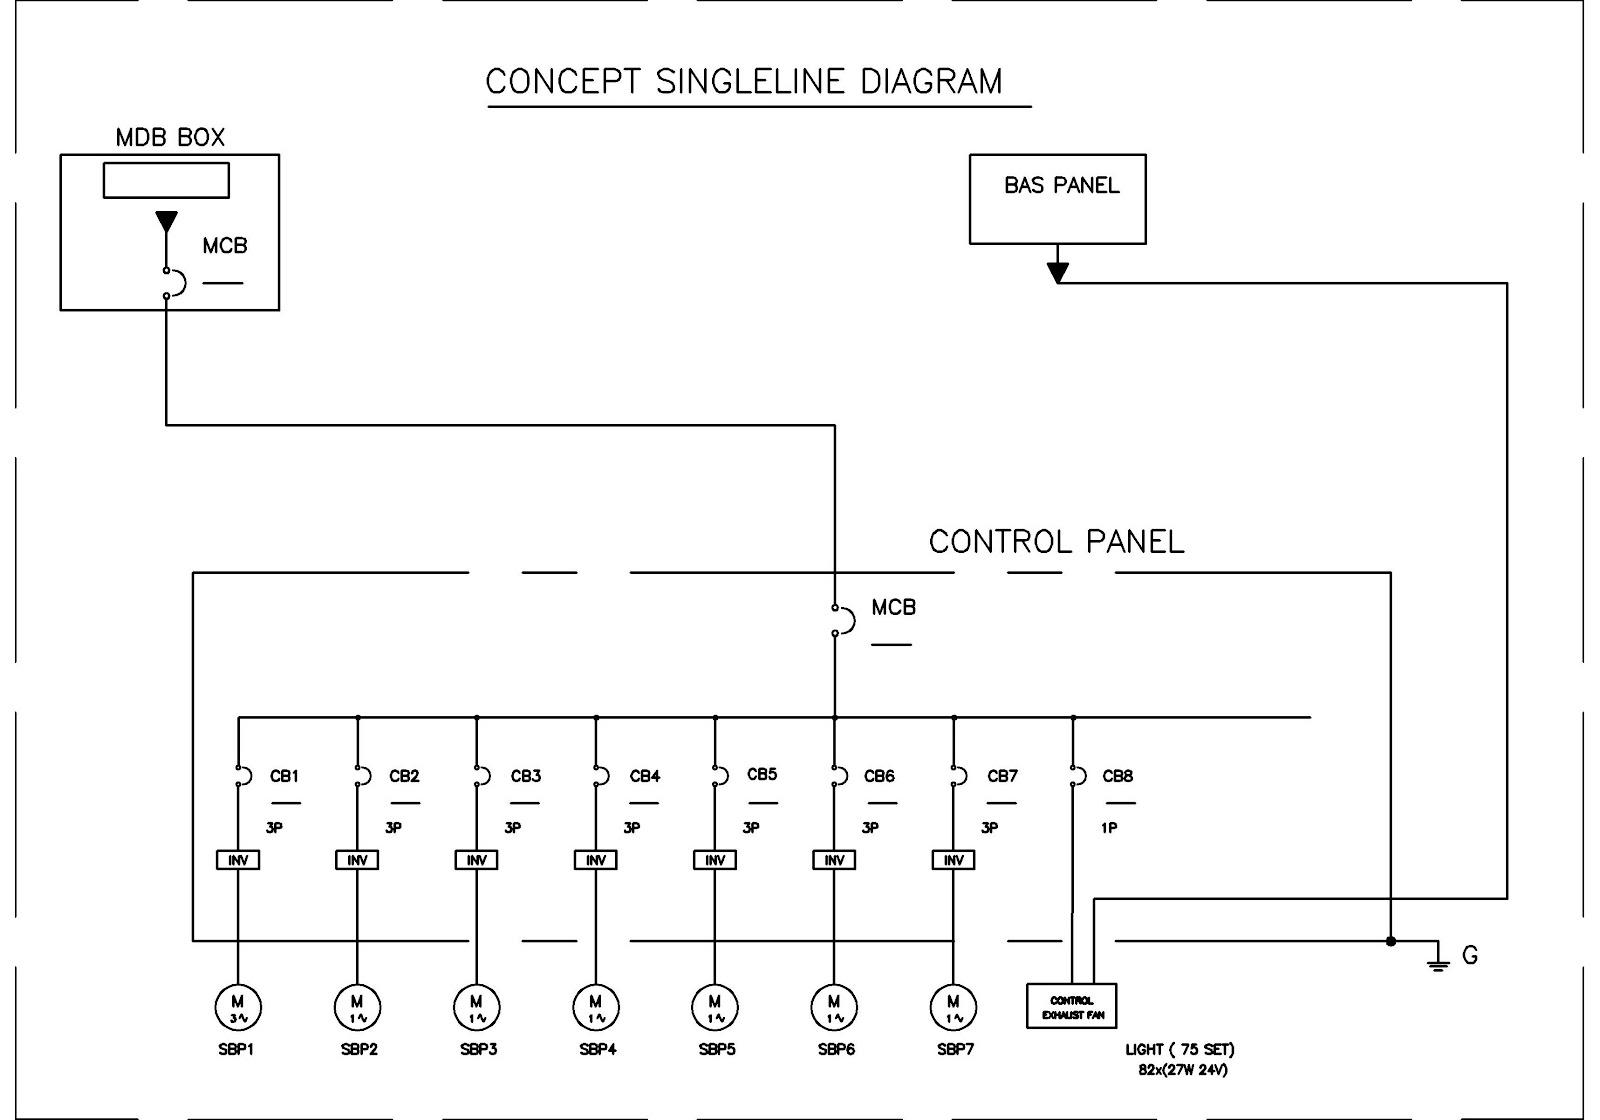 Reading One Line Electrical Diagram Intertherm Heat Pump Wiring ระบบควบคม งานวงจรควบคม การออกแบบวงจรควบคมไฟฟา Control